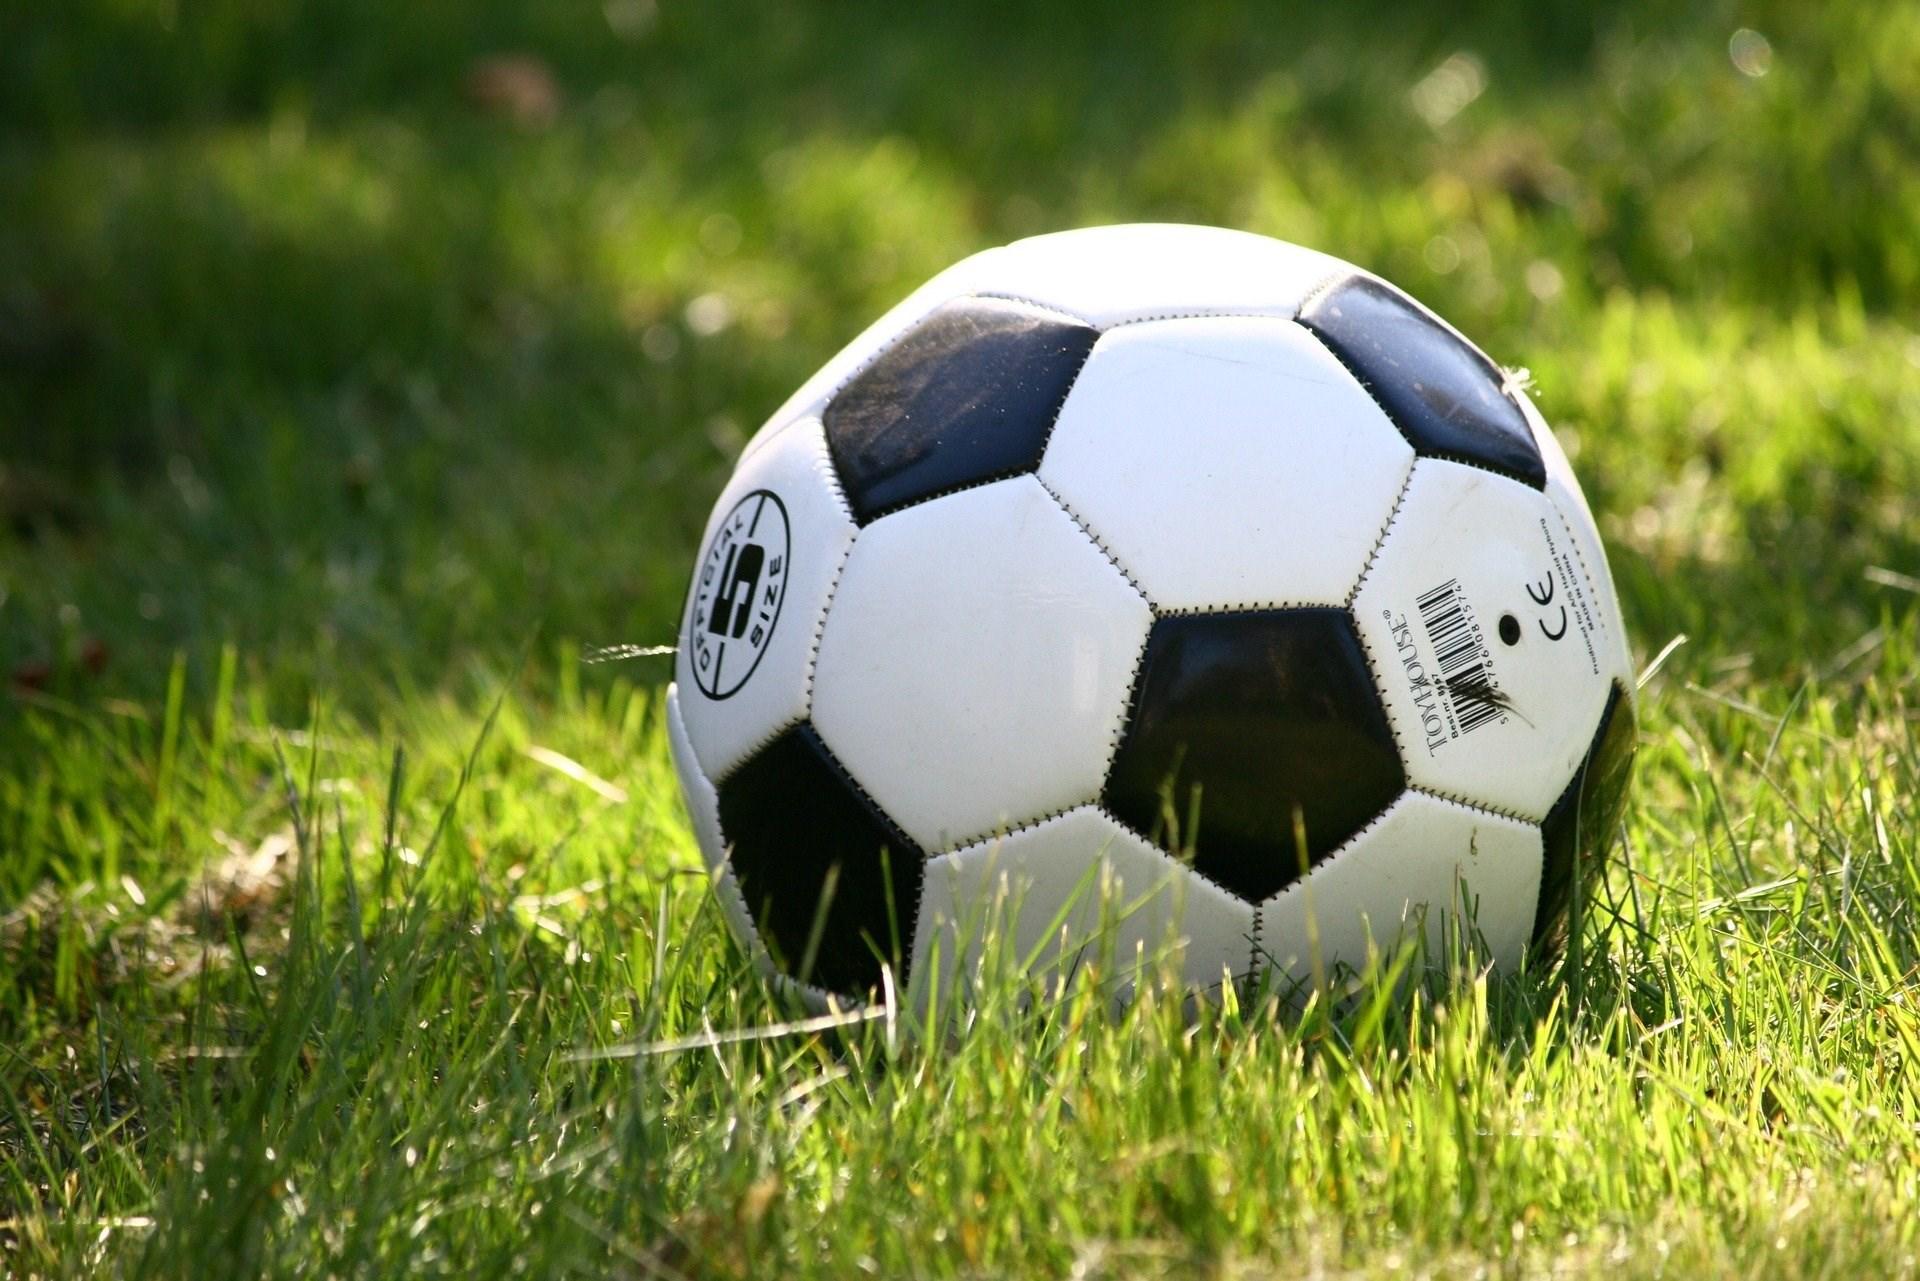 Stoke City v West Bromwich Albion (Football League)